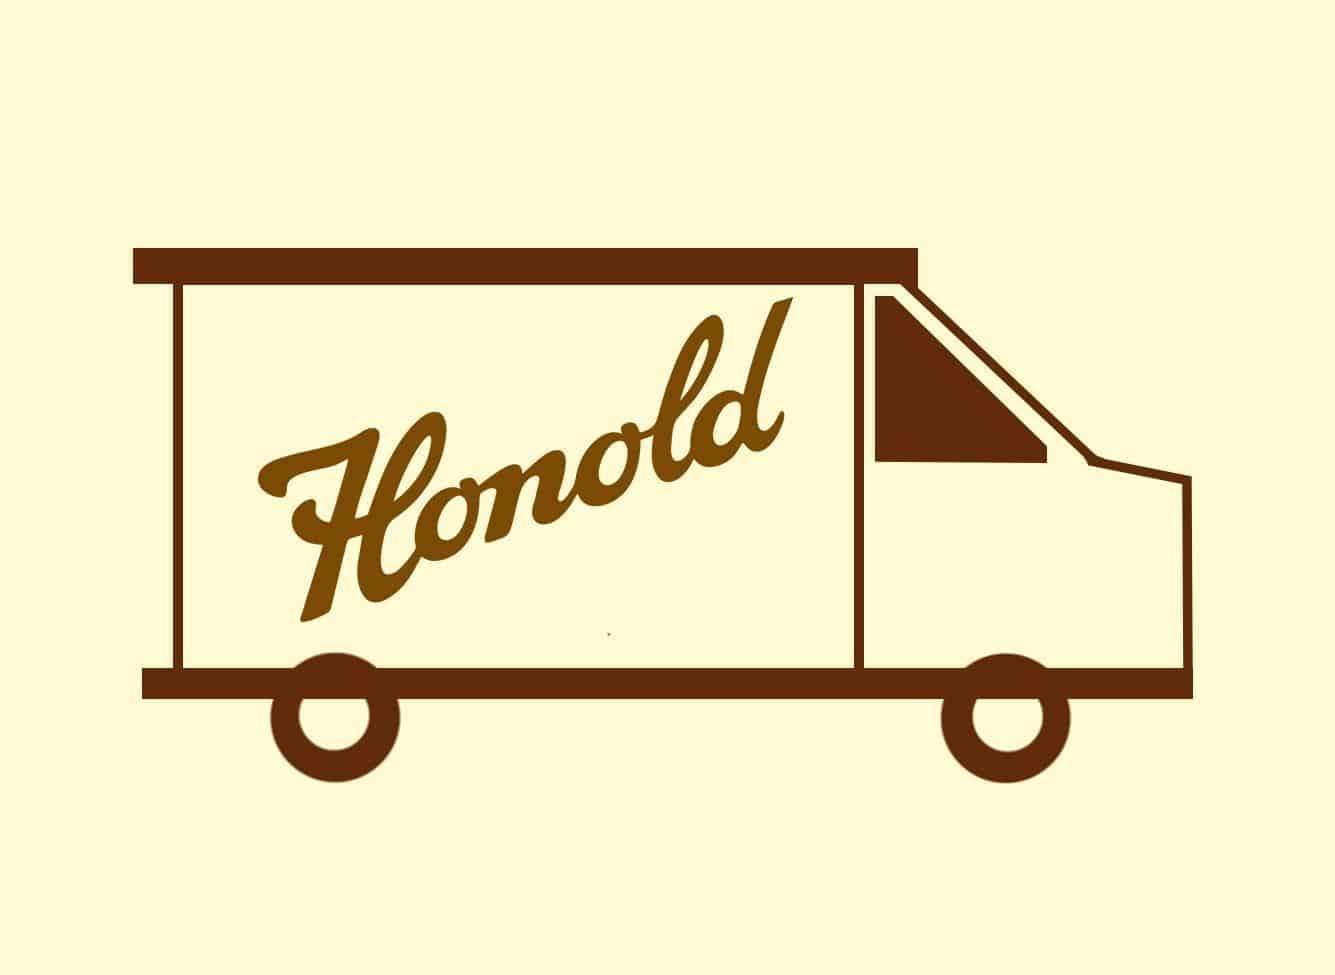 Honold - Ordering Food and Take Aways in Lockdown Zurich